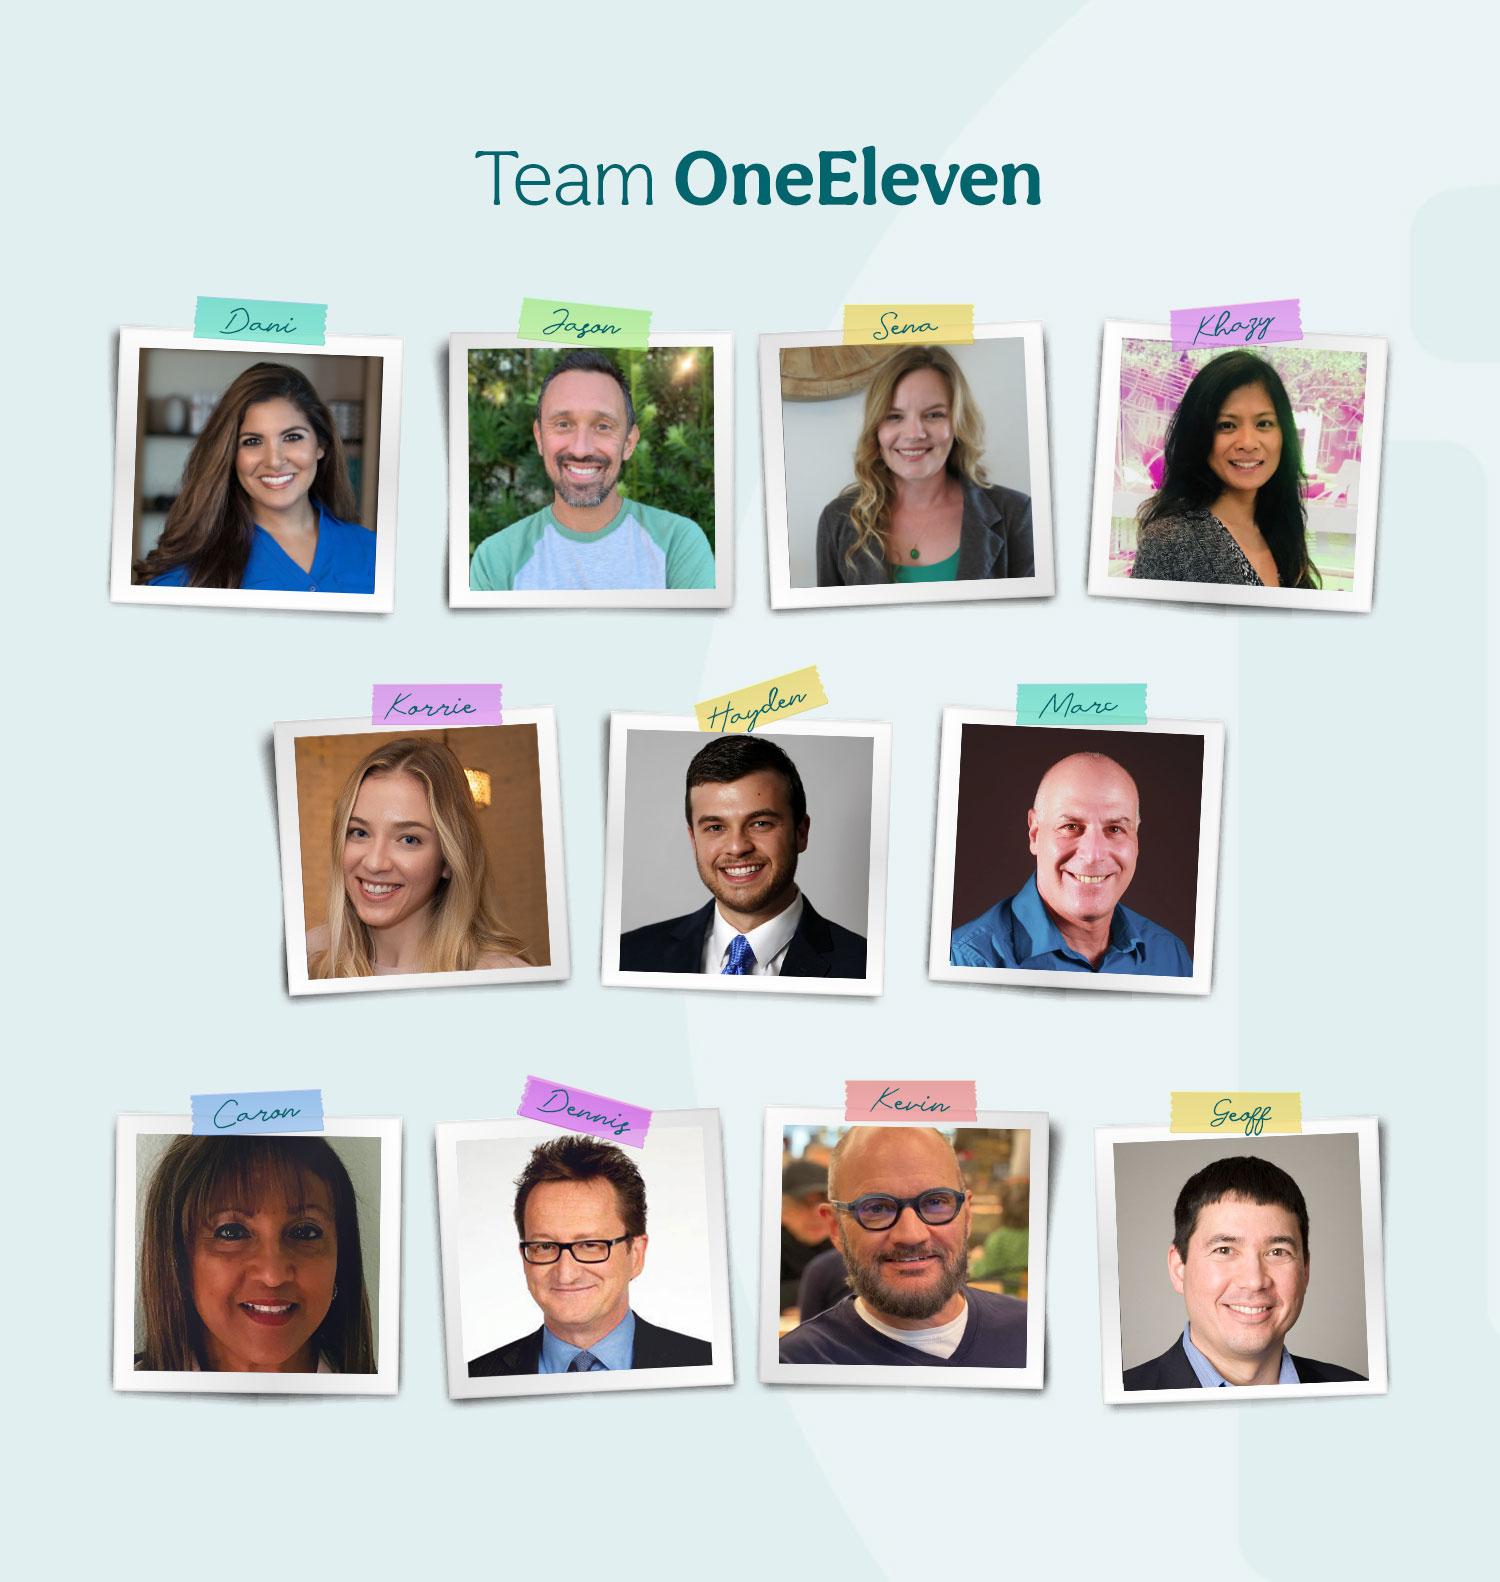 Team One Eleven